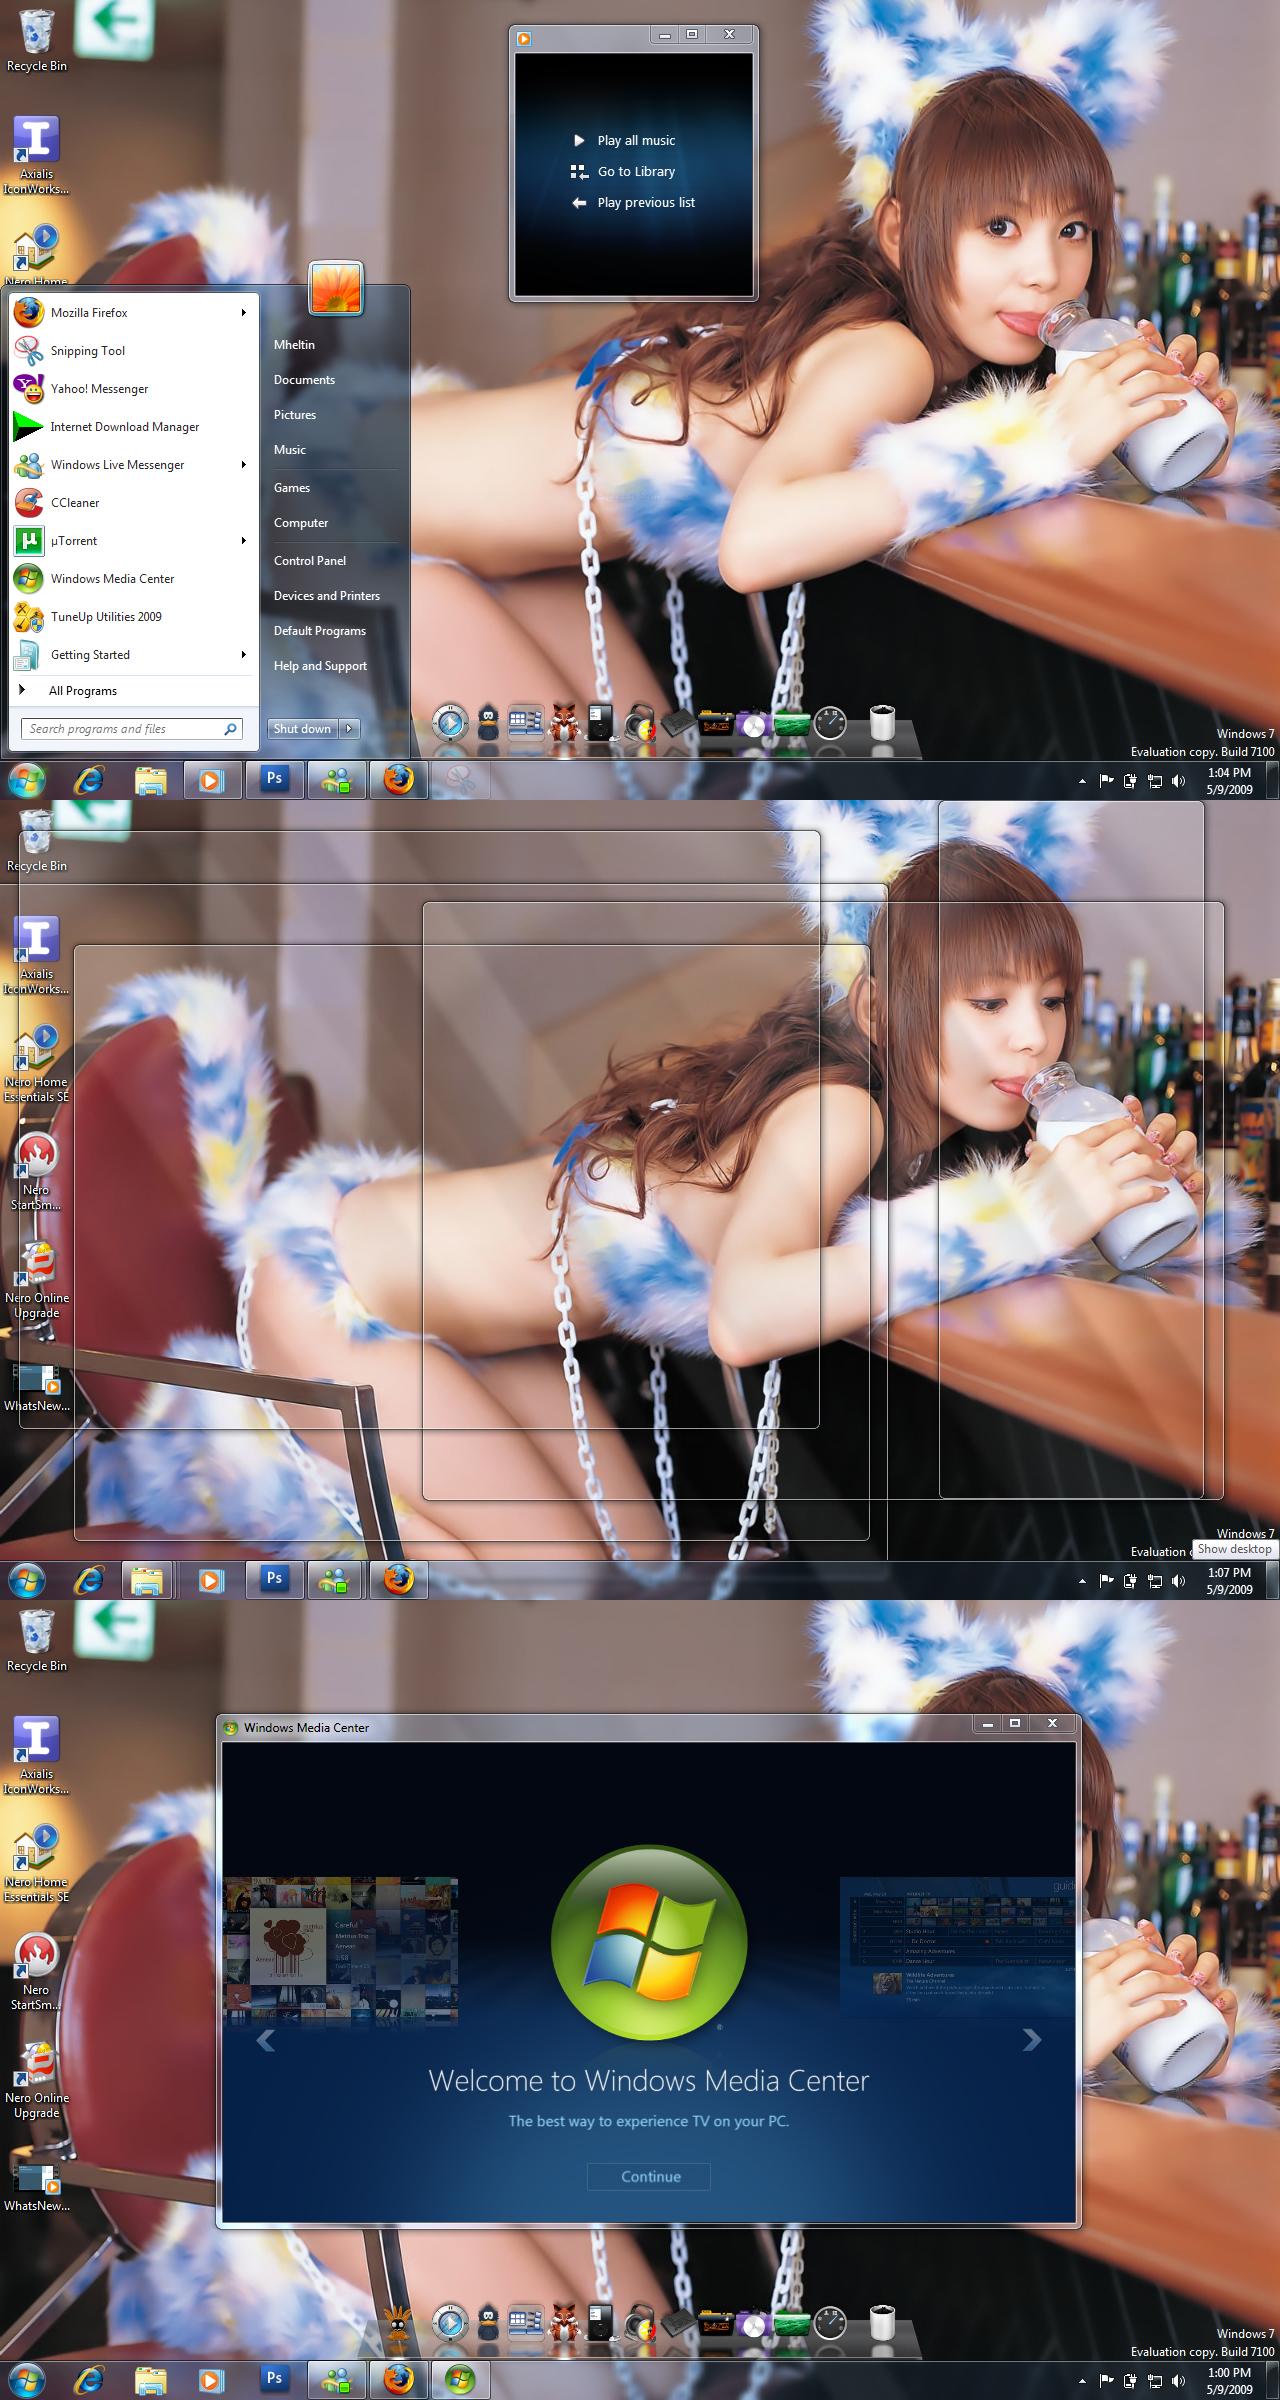 May Desktop by Mheltin